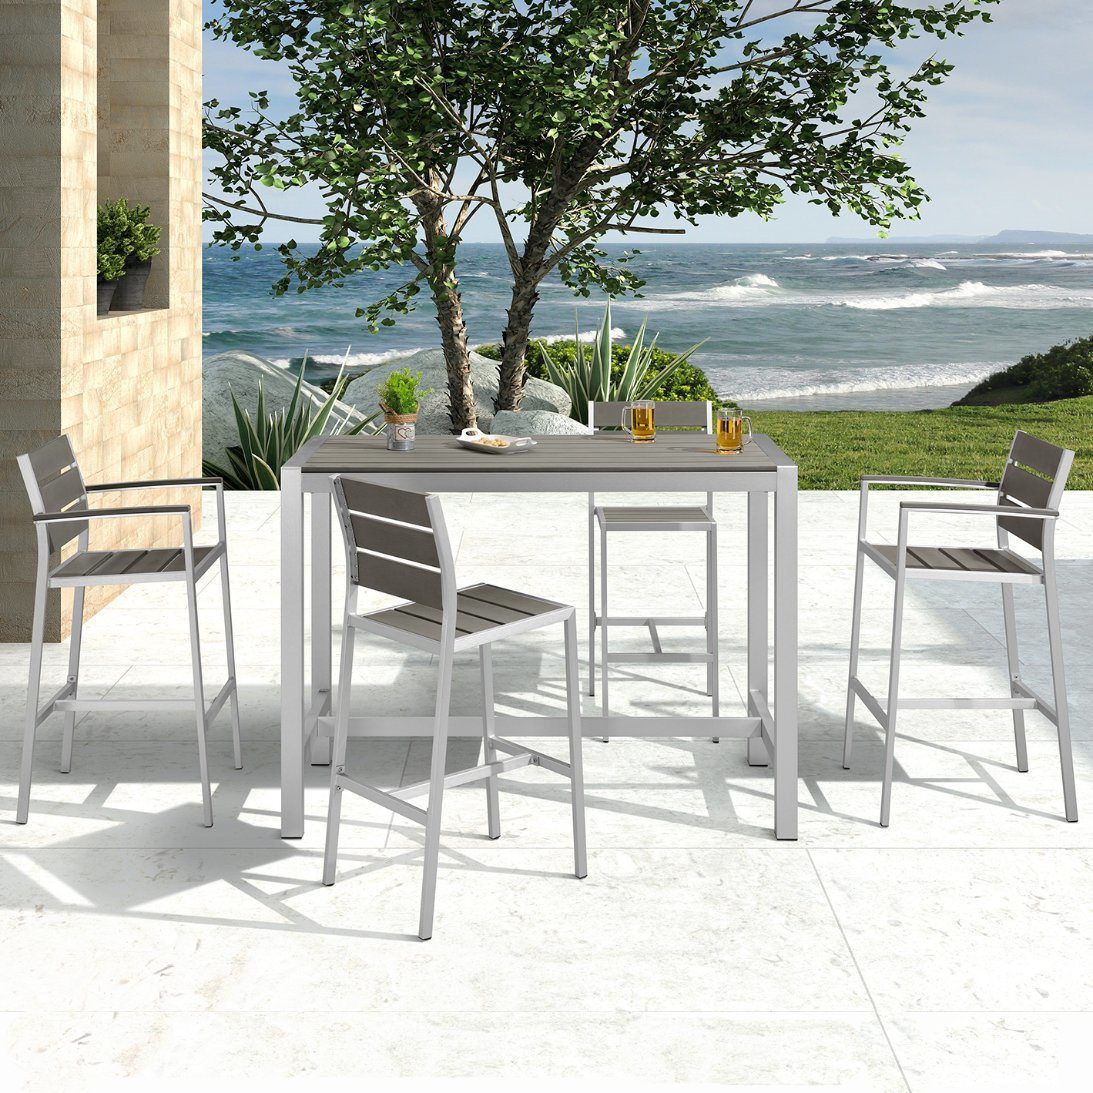 china bar height patio furniture 5